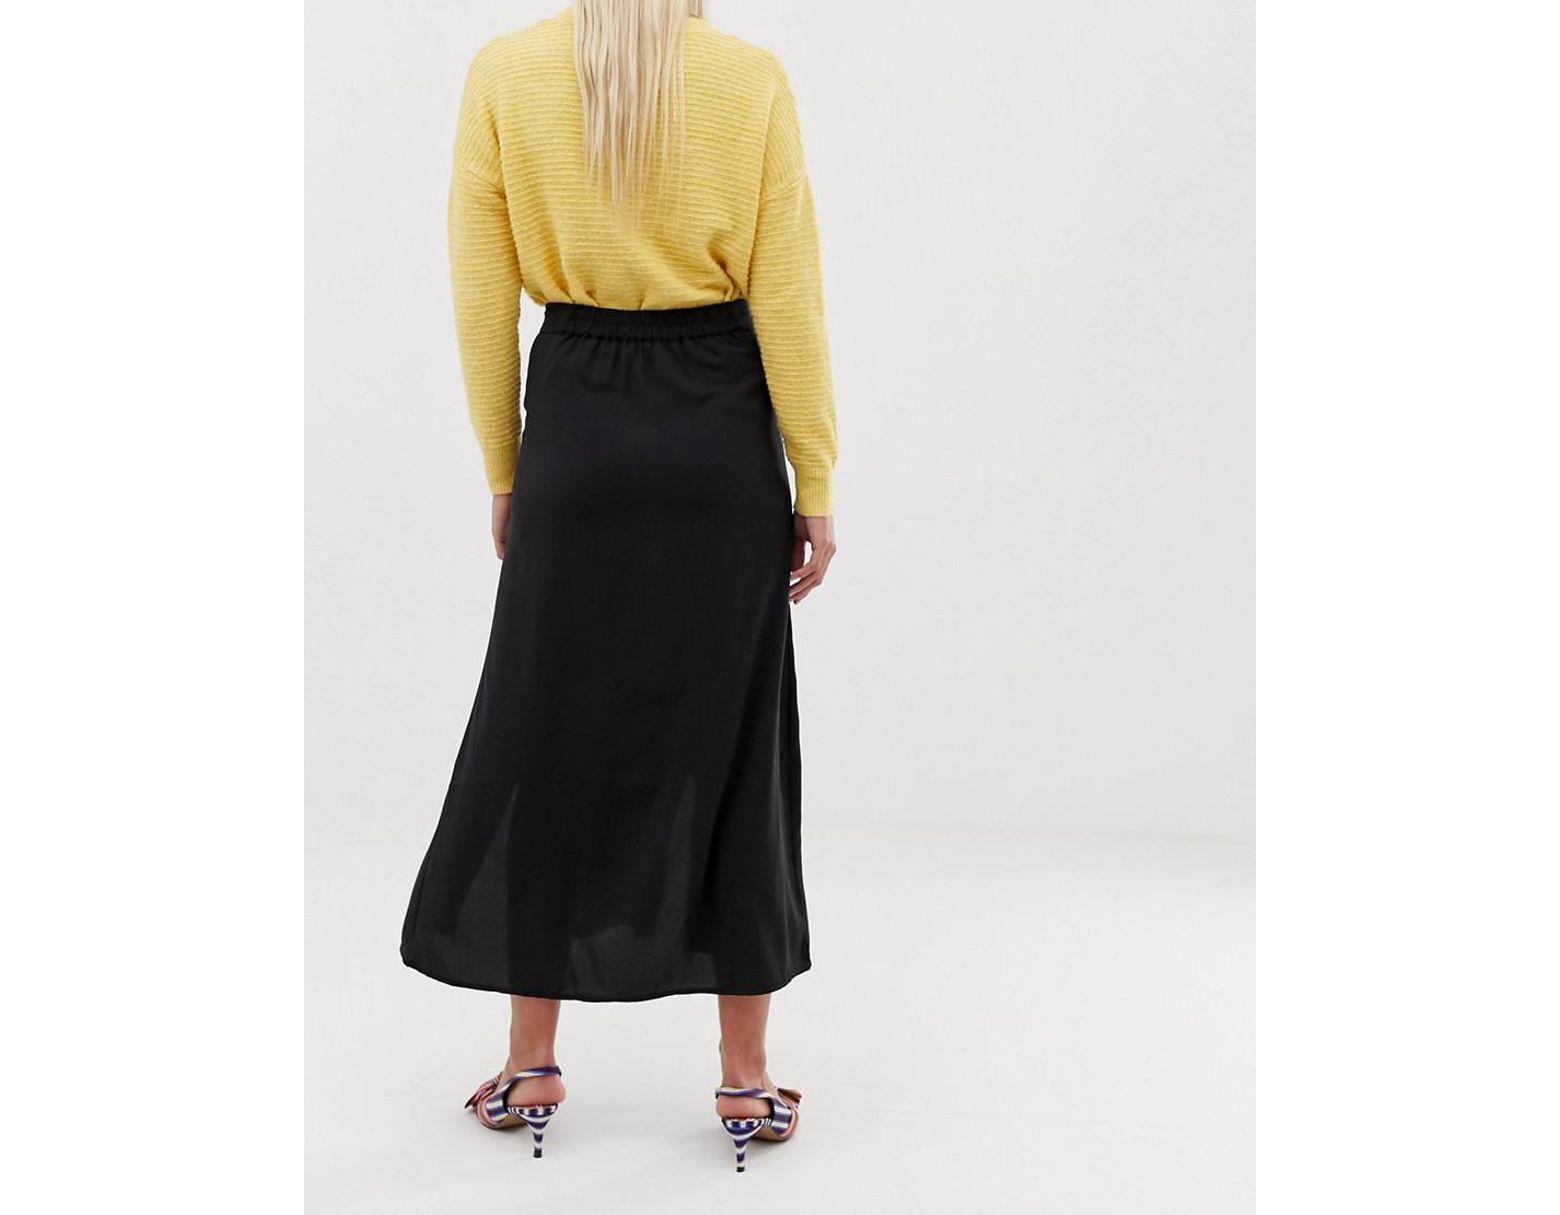 bdcaa1b1fb Vero Moda Double Split Button Front Midaxi Skirt In Black in Black - Lyst